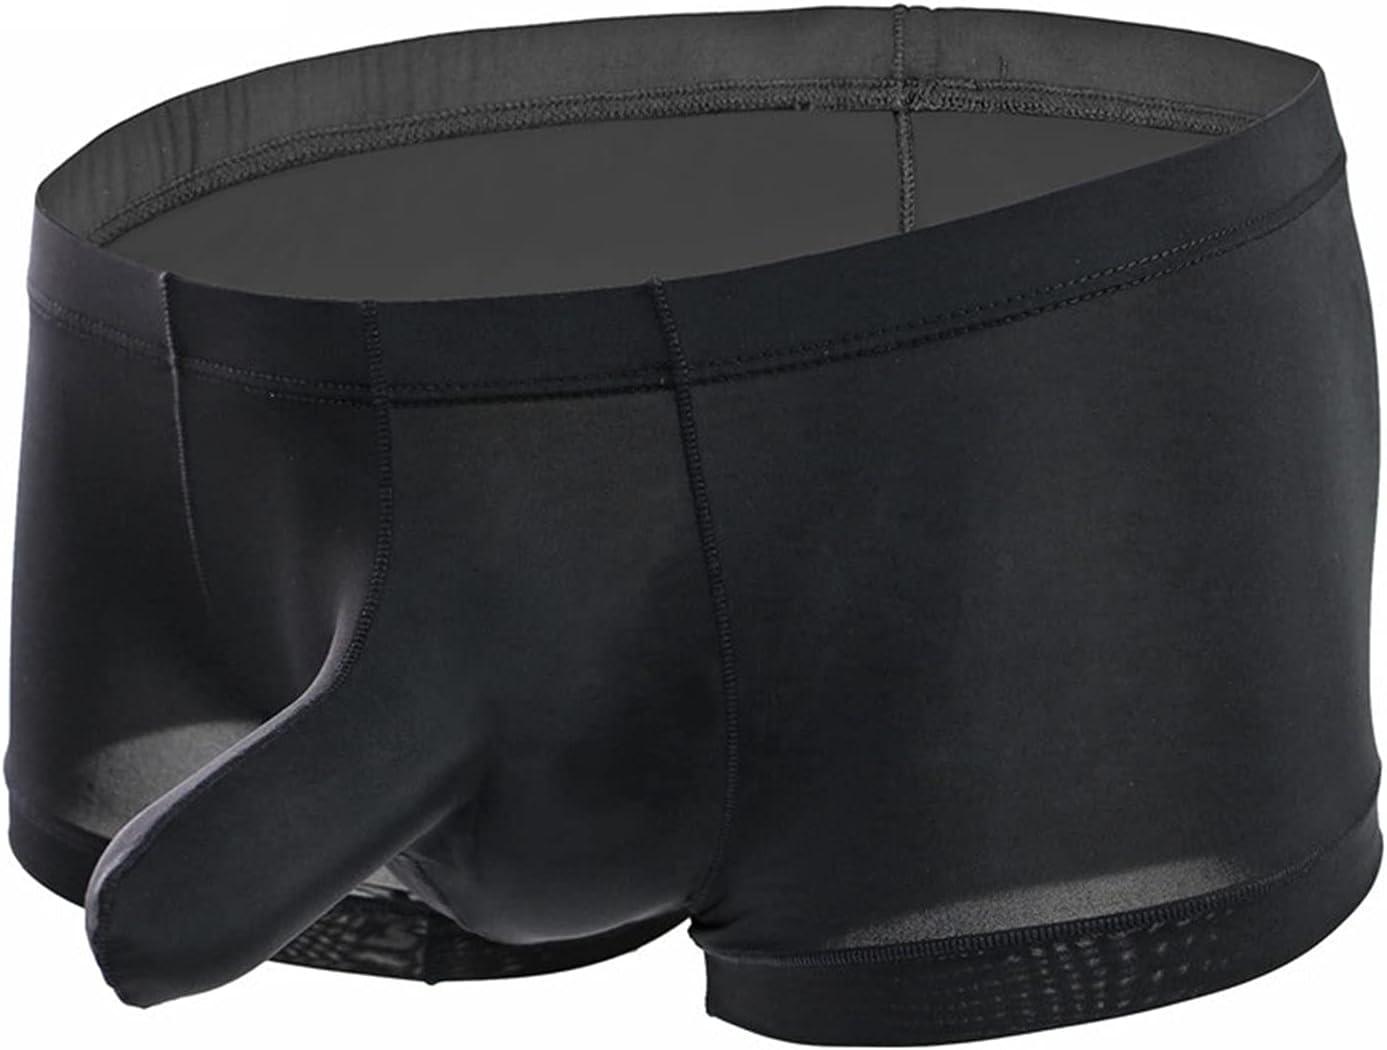 Mens Elephant Nose Soft Boxer Briefs Bulge Pouch Breathable Thong Underpants Low Rise Sexy U Convex Jockstrap Underwear (Black,Medium)